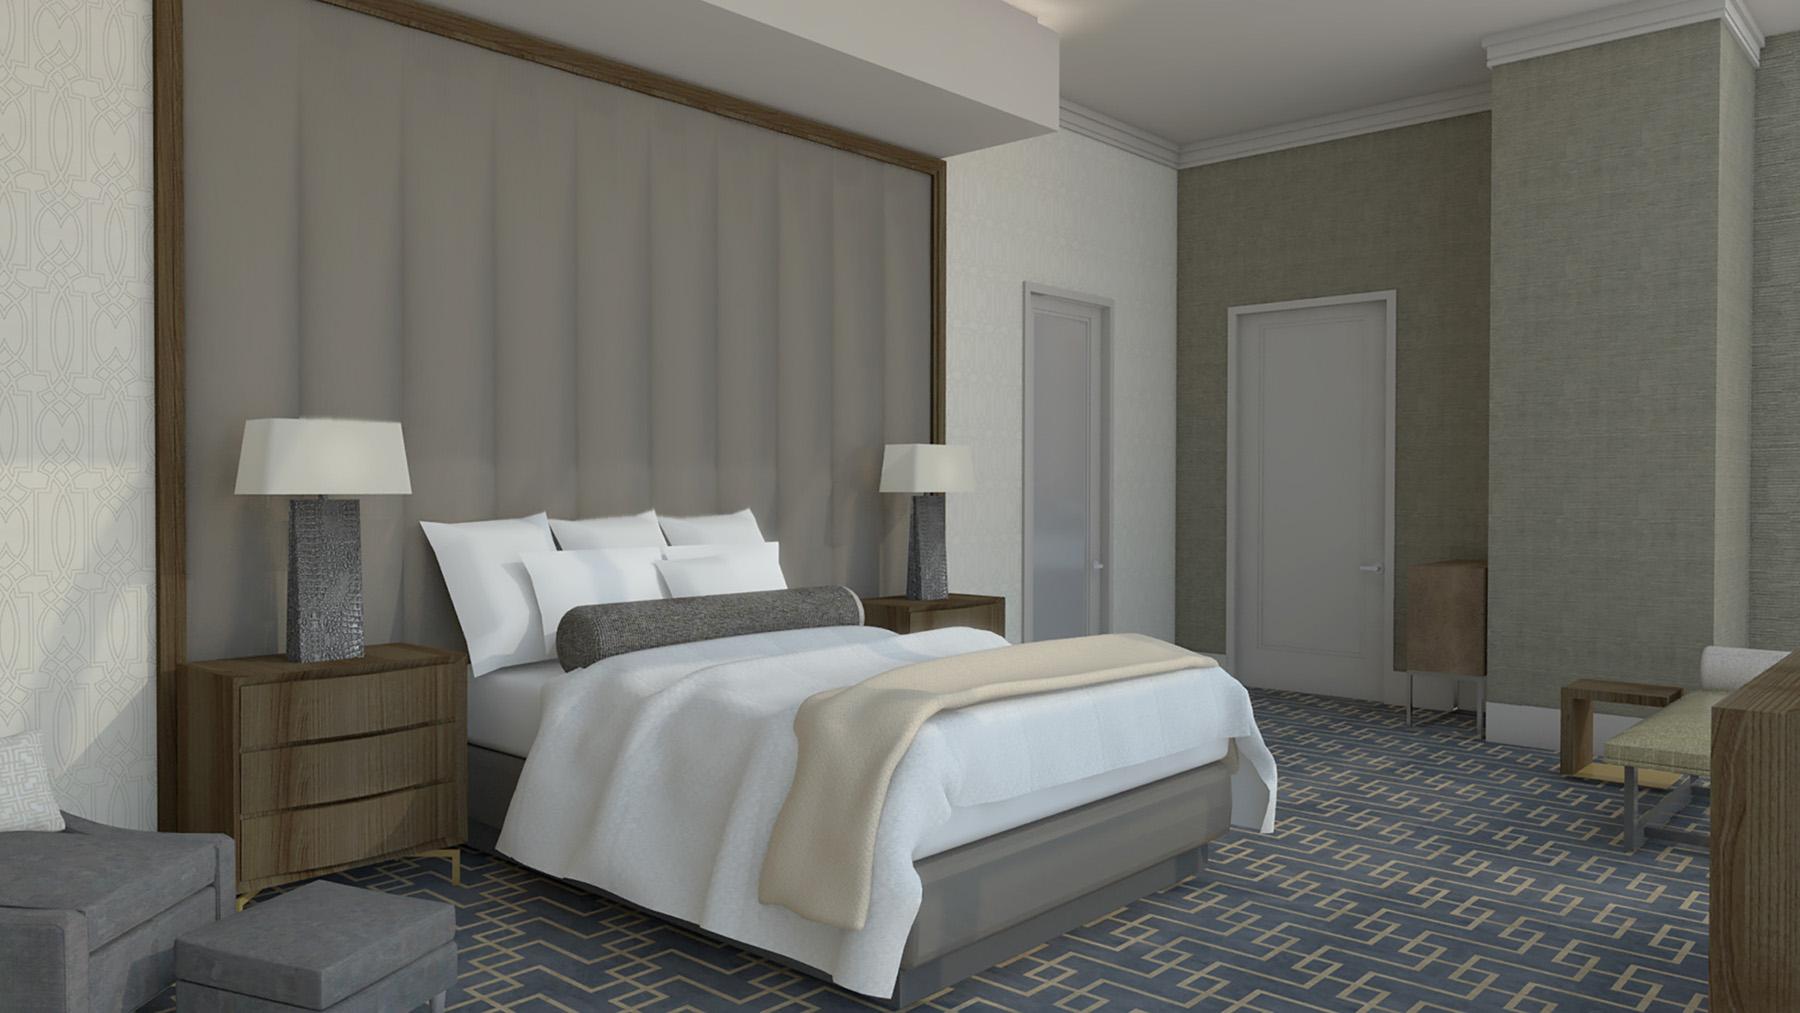 Hospitality Architecture Interior Design Golden Nugget Atlantic City Villa Master Bedroom